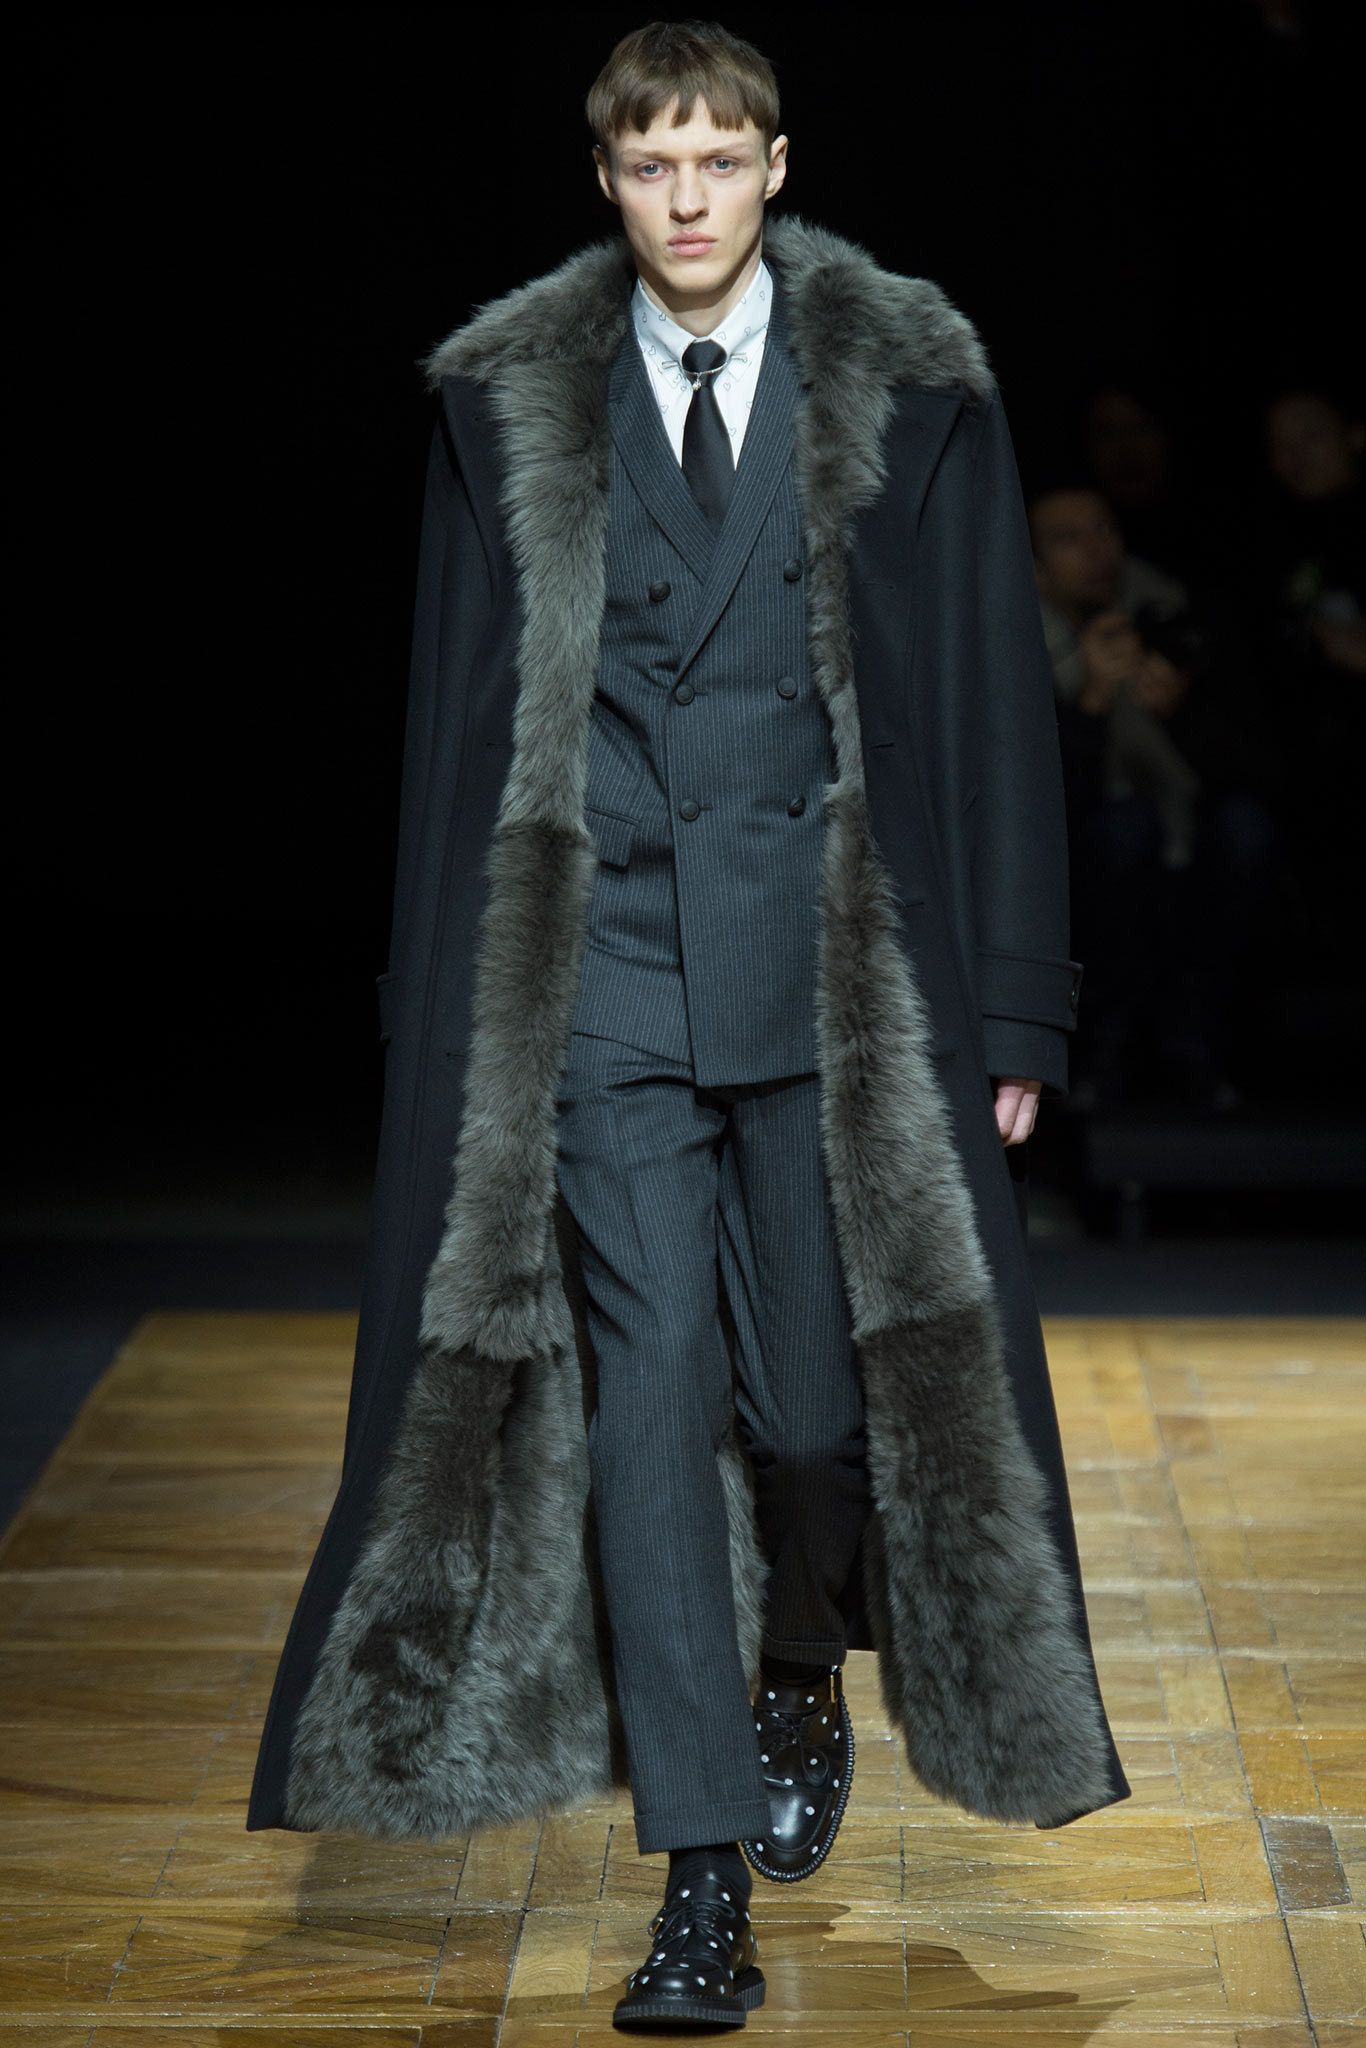 Dior Men Fall 2014 Menswear Fashion Show в 2020 г